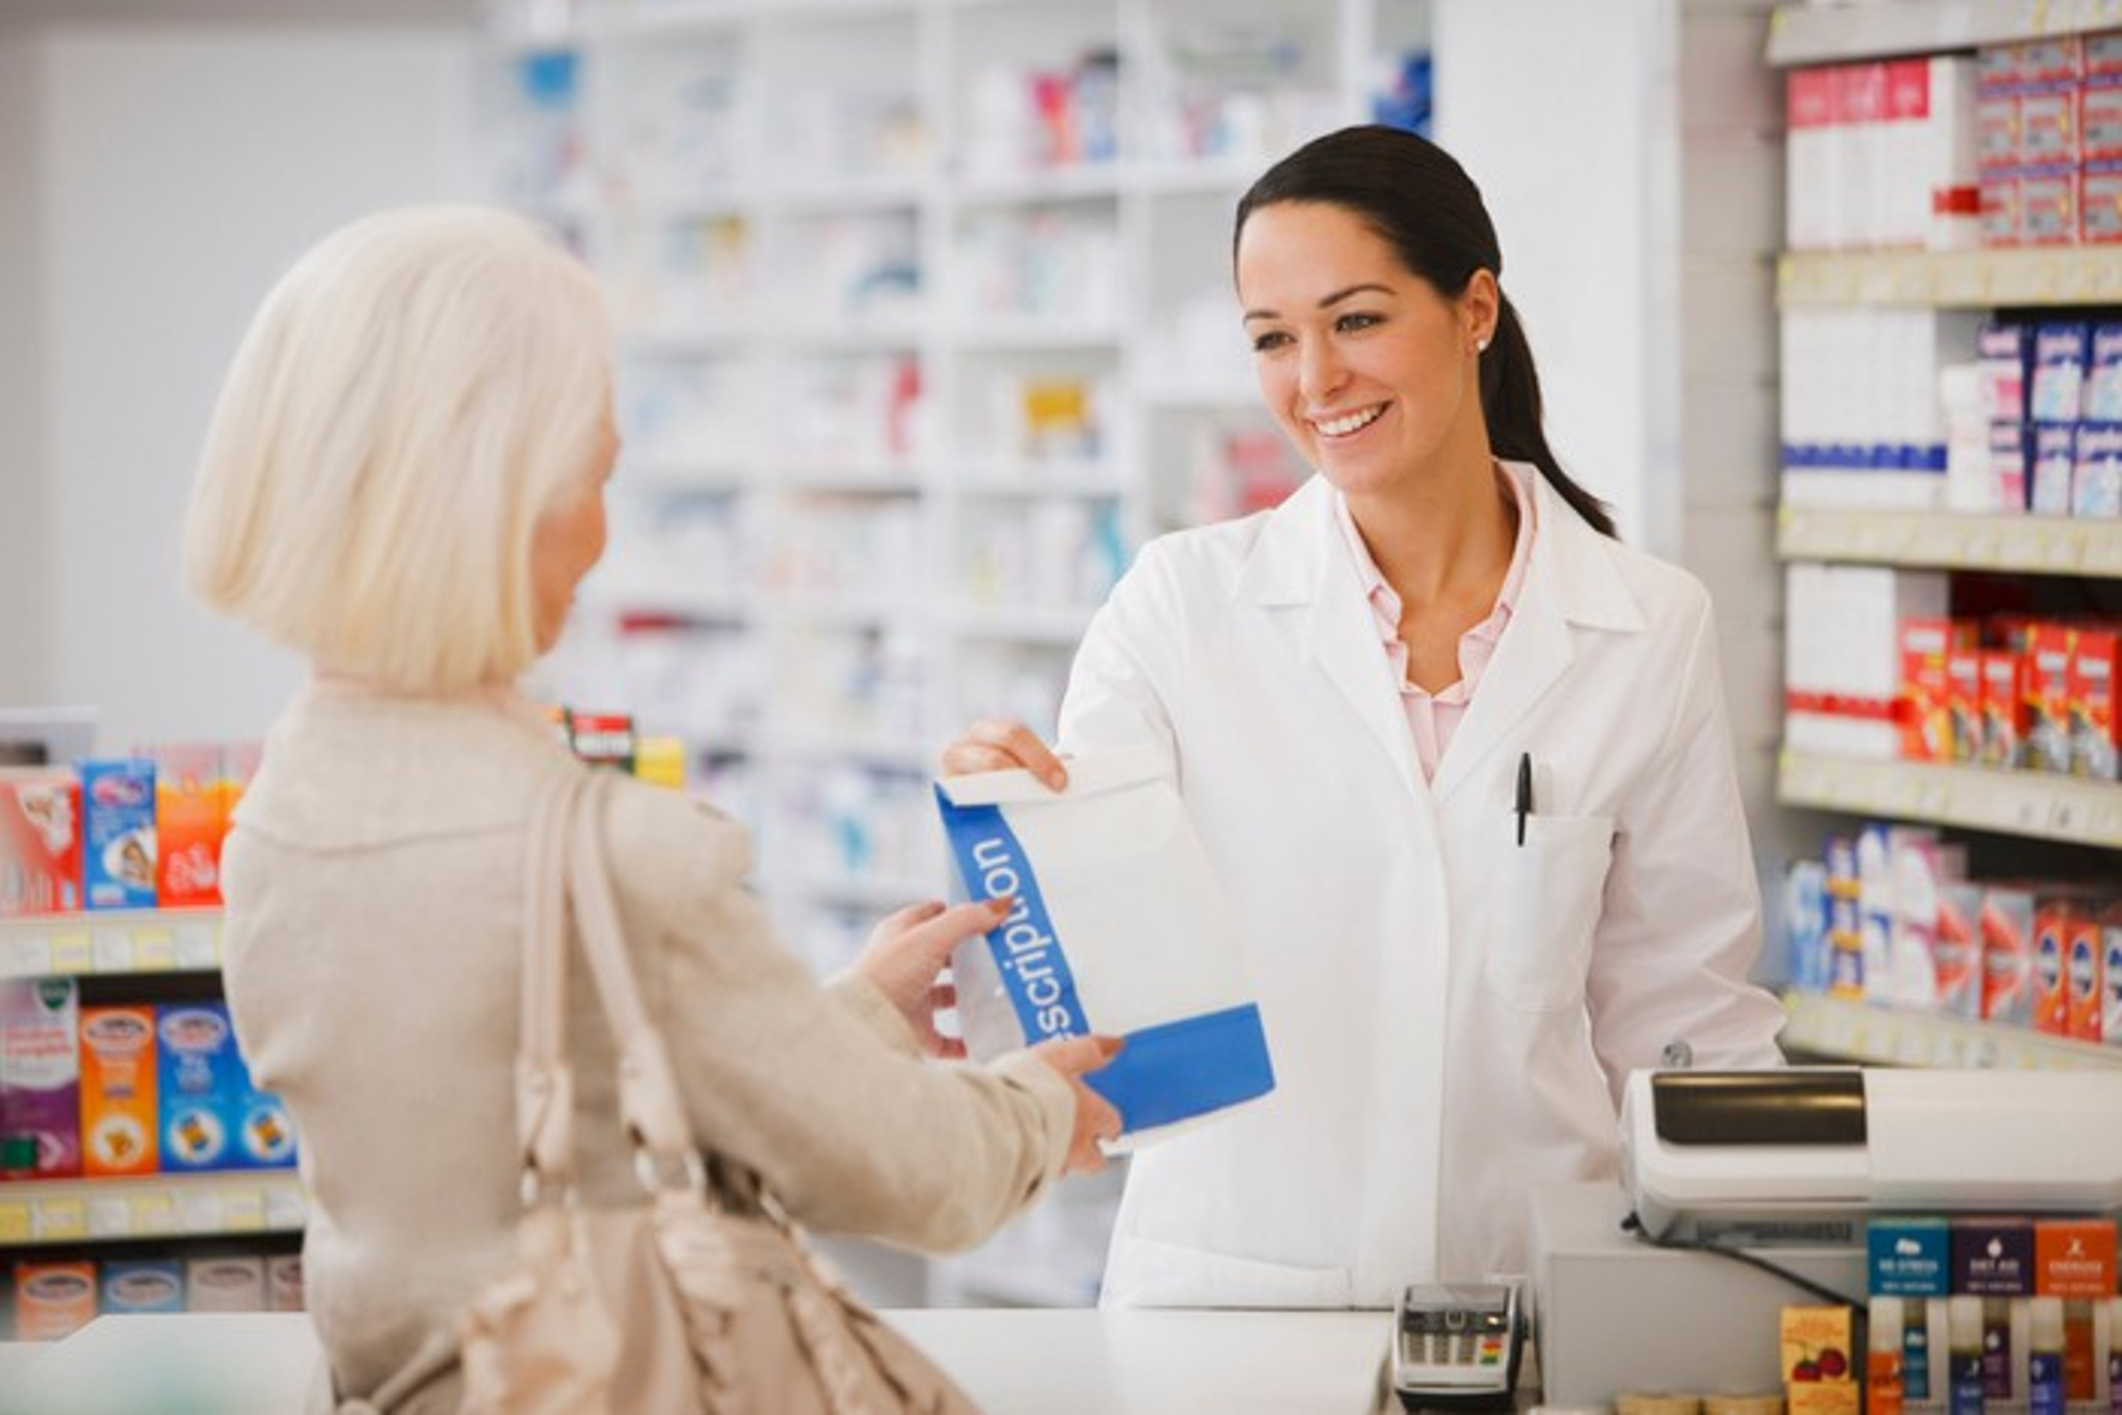 A pharmacist hands out a prescription.